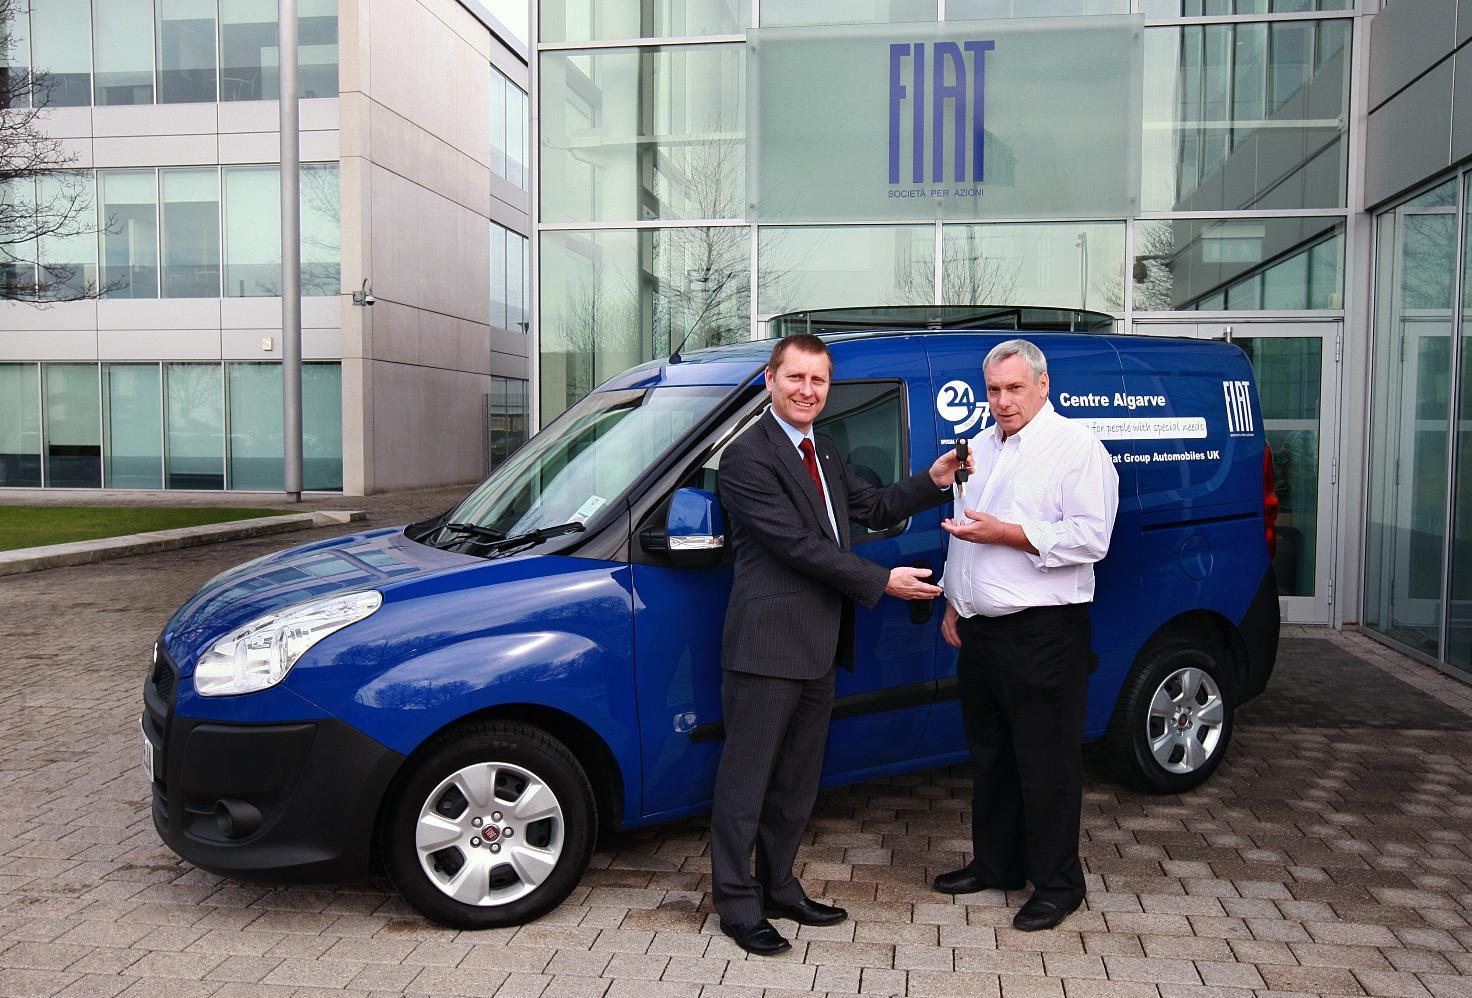 Fiat Doblo Cargo Van Donated To Special Needs Holiday Trust